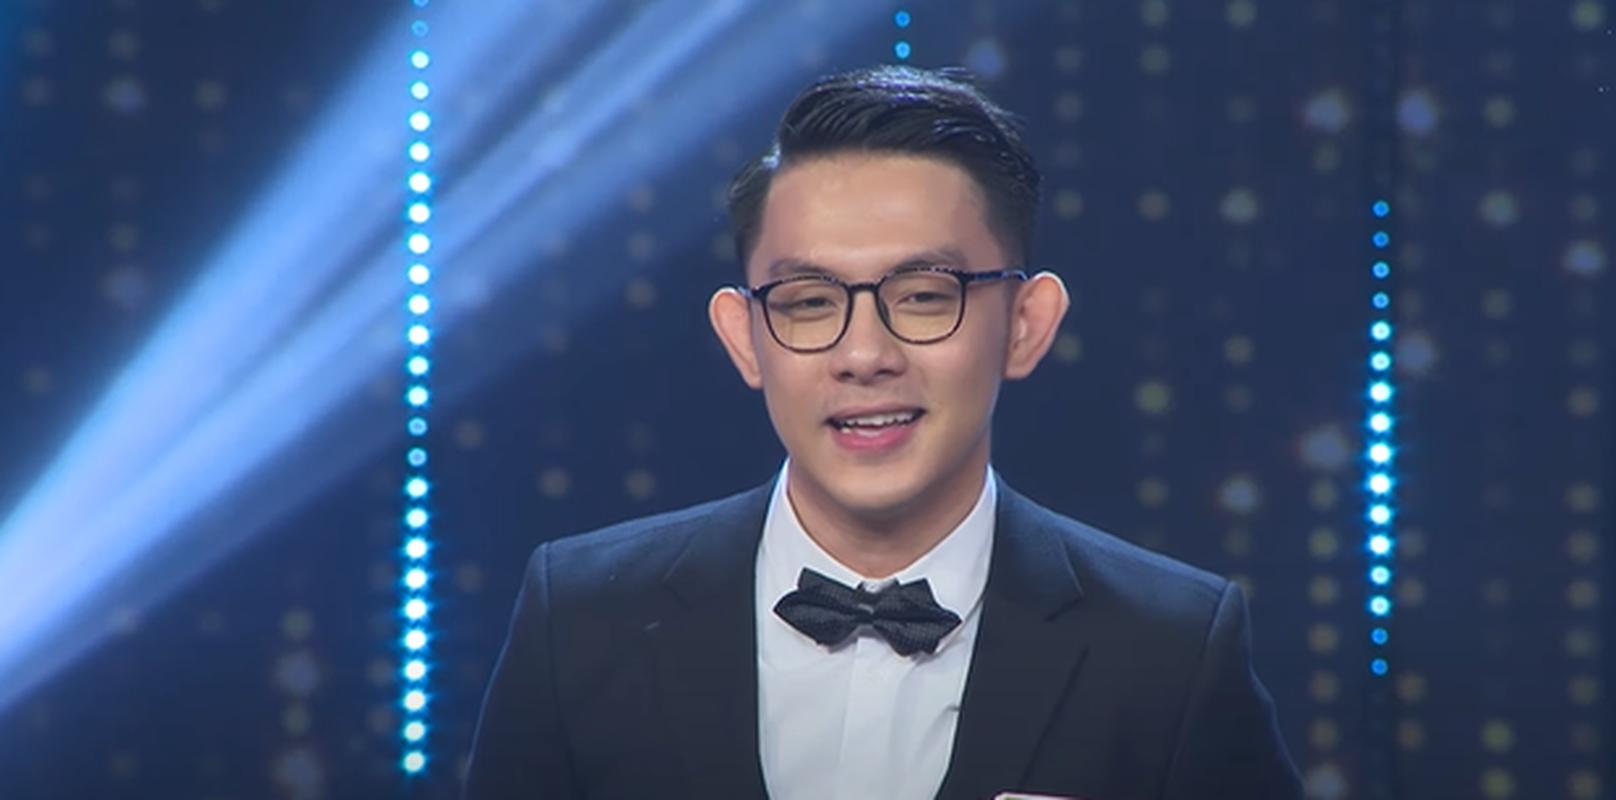 Dan tinh sam soi gia the sieu khung cua CEO Tong Dong Khue-Hinh-2